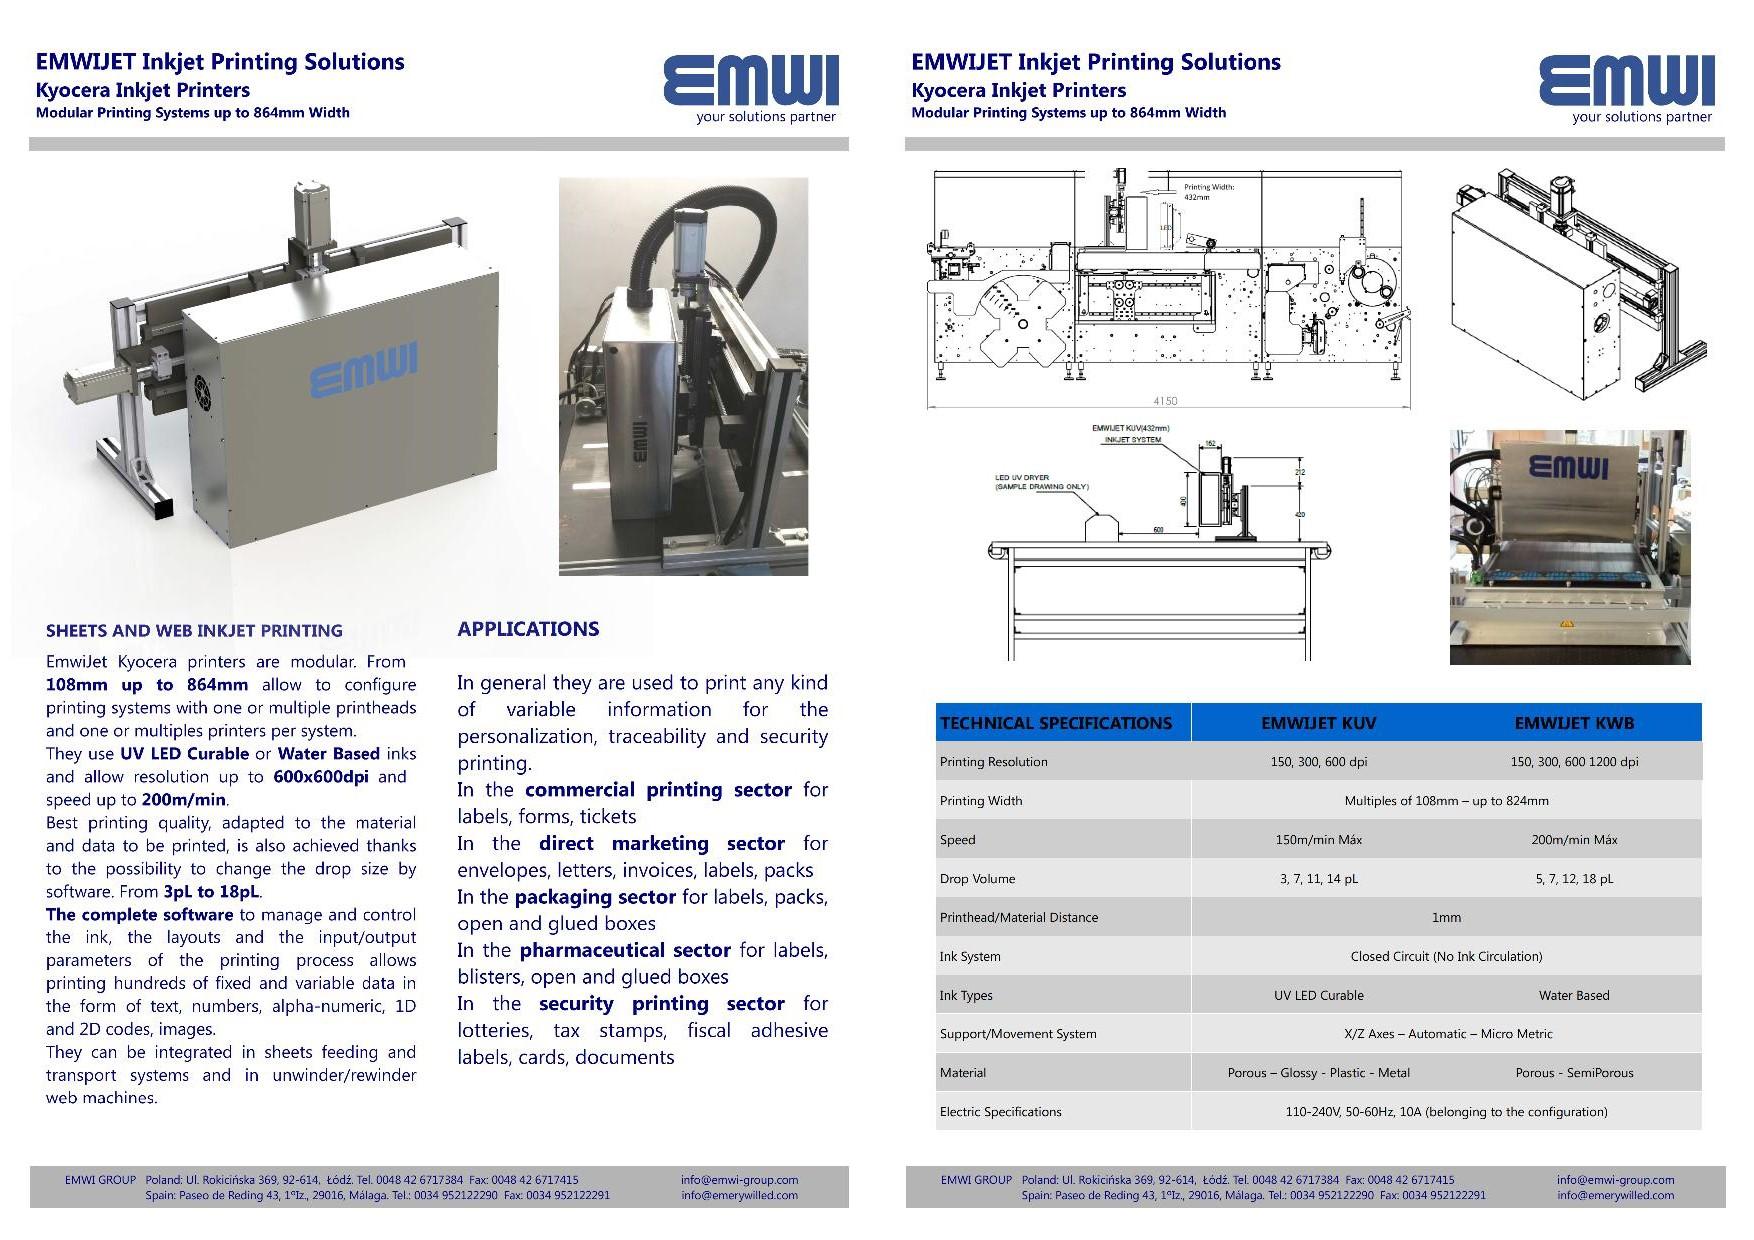 Kyocera Inkjet System Printer Emwi